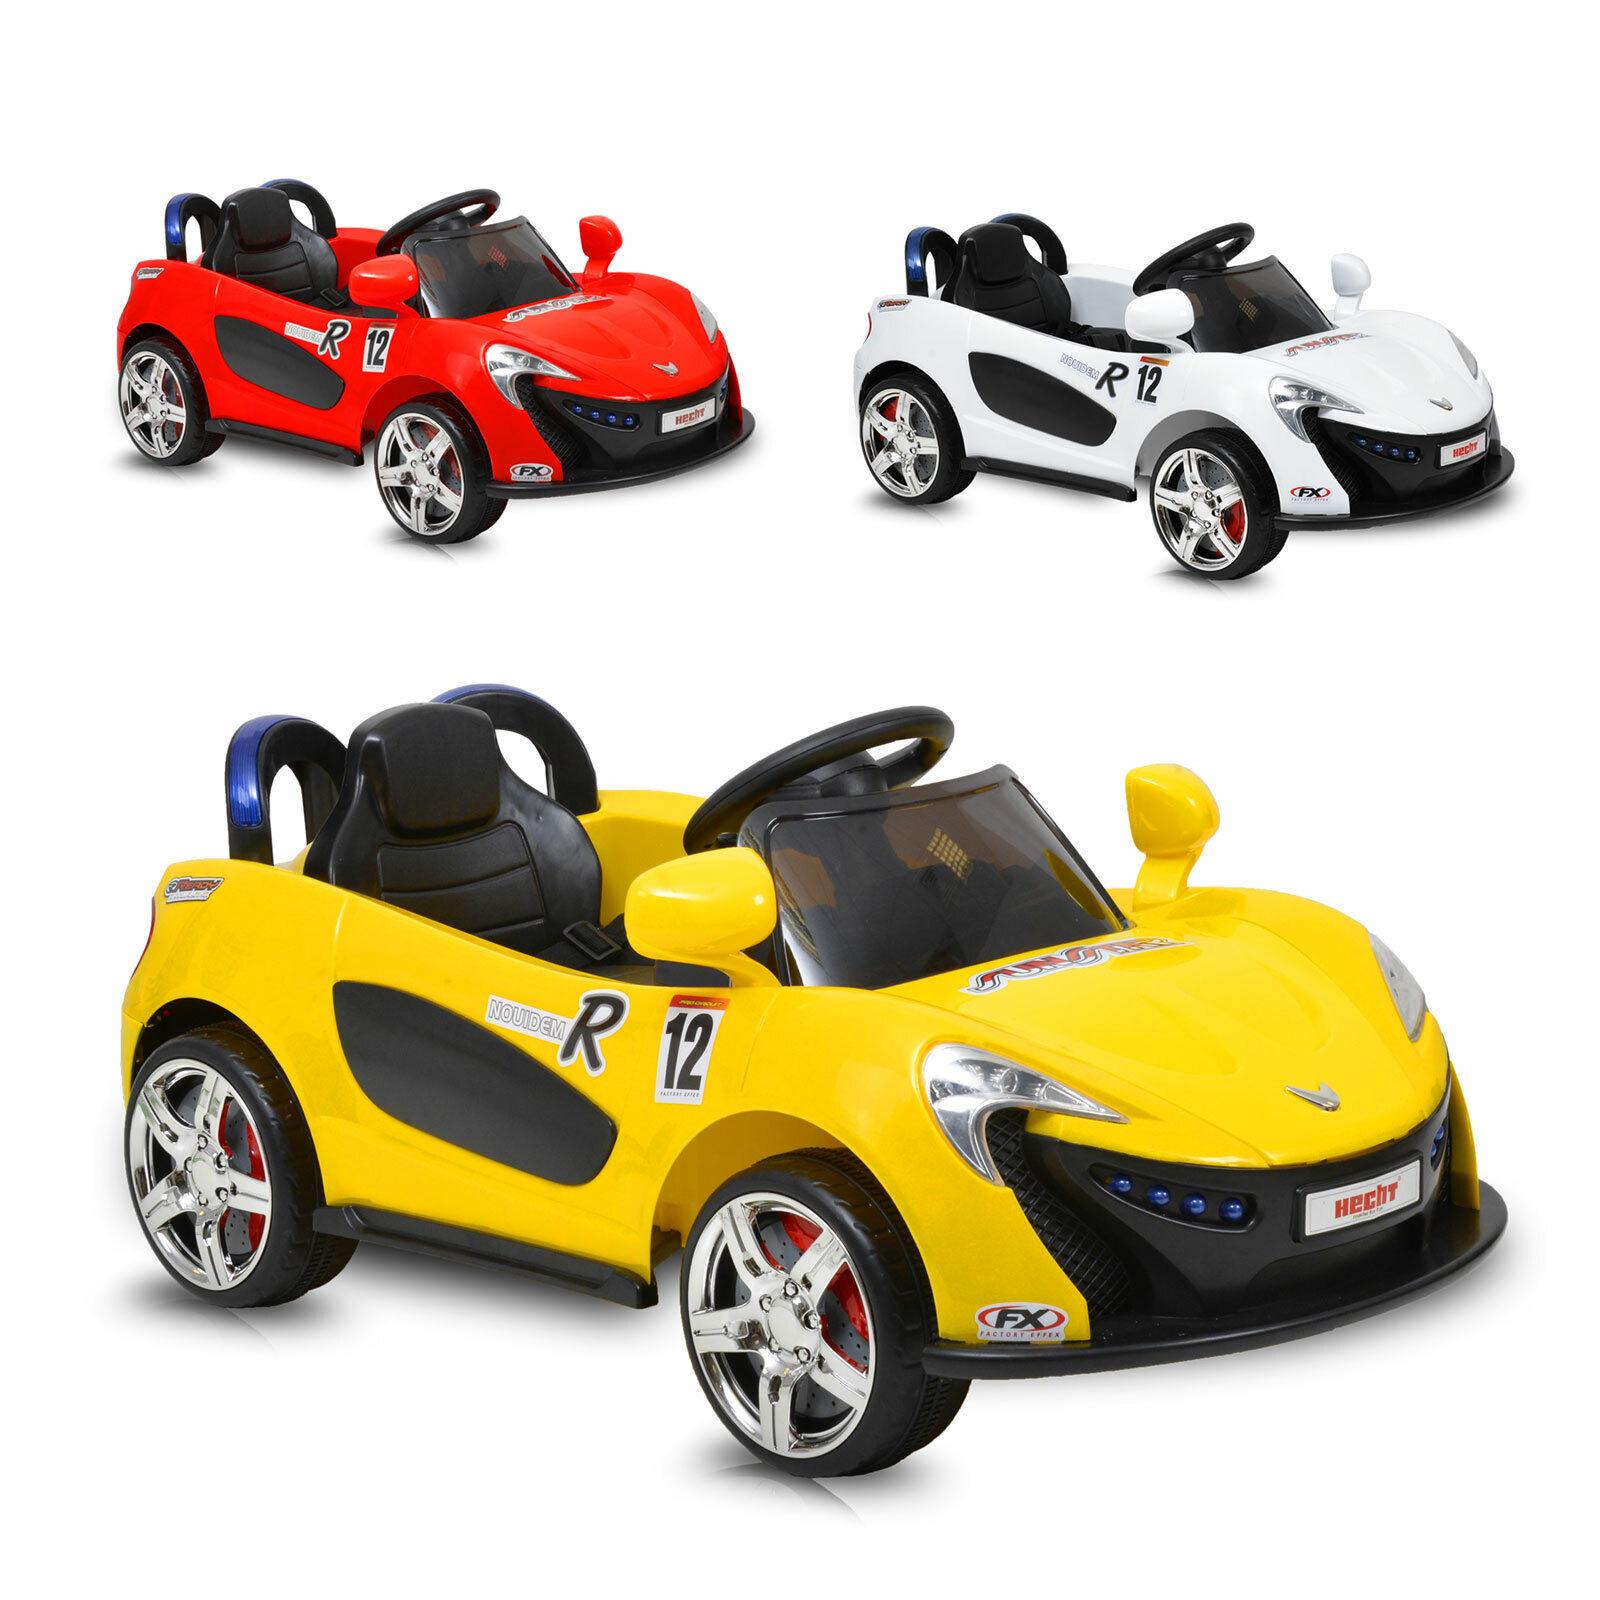 Kinderauto Elektroauto Akku Kinderauto Kinderfahrzeug Kinder Akku Car